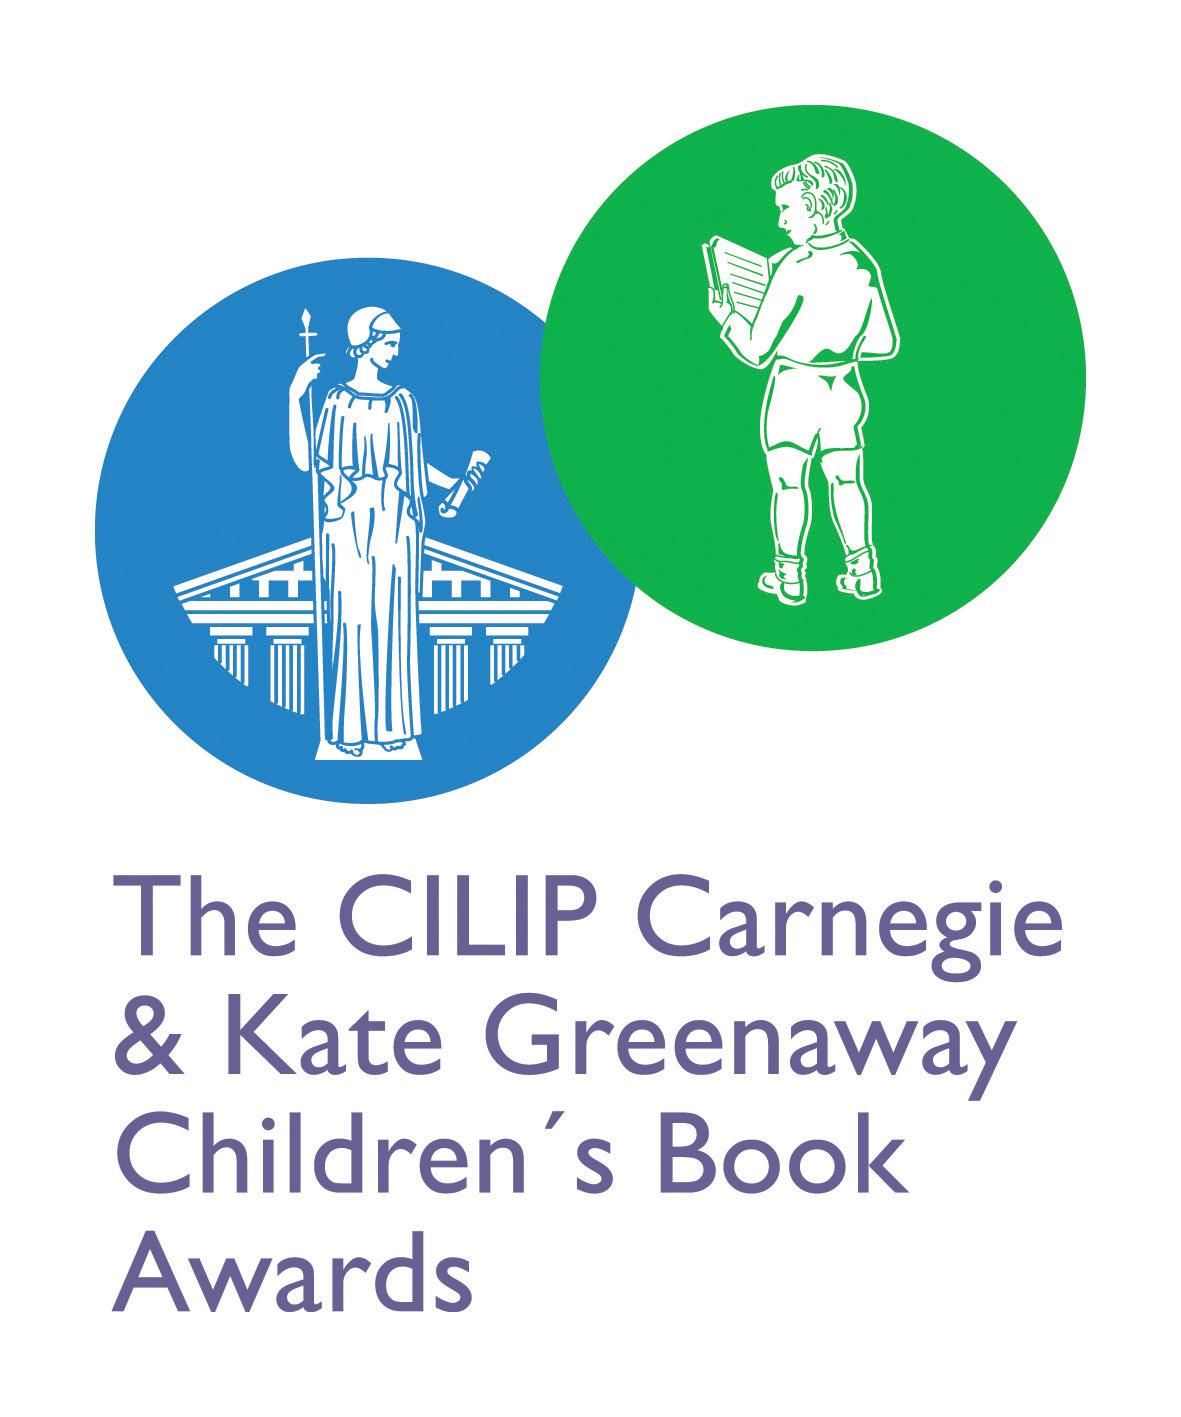 2019 Carnegie Medal Shortlist